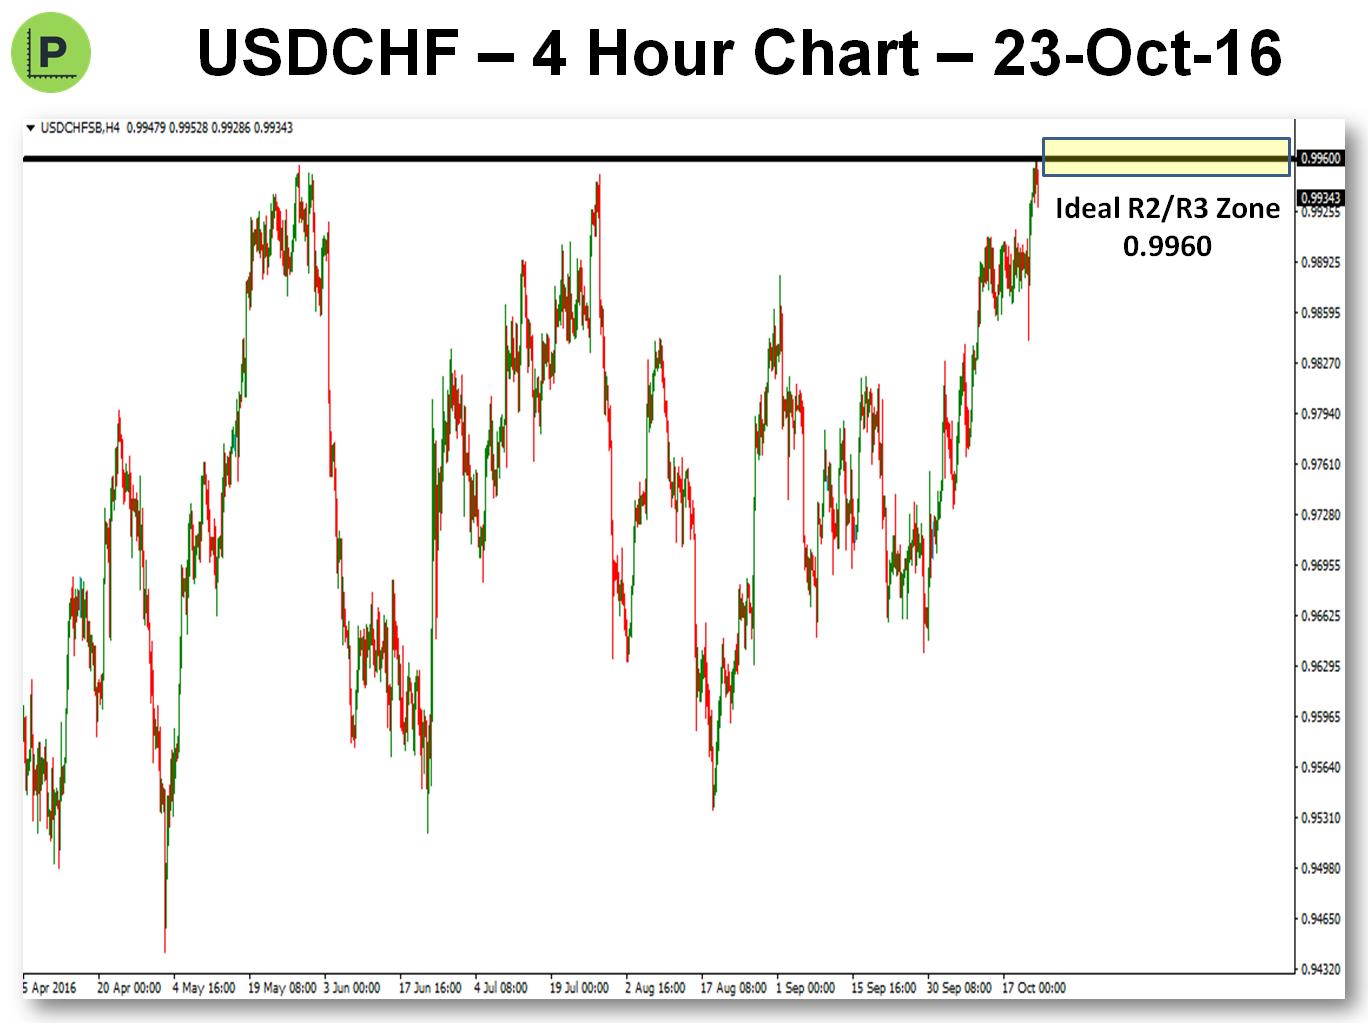 potential-pivot-trade-23-oct-16-usdchf